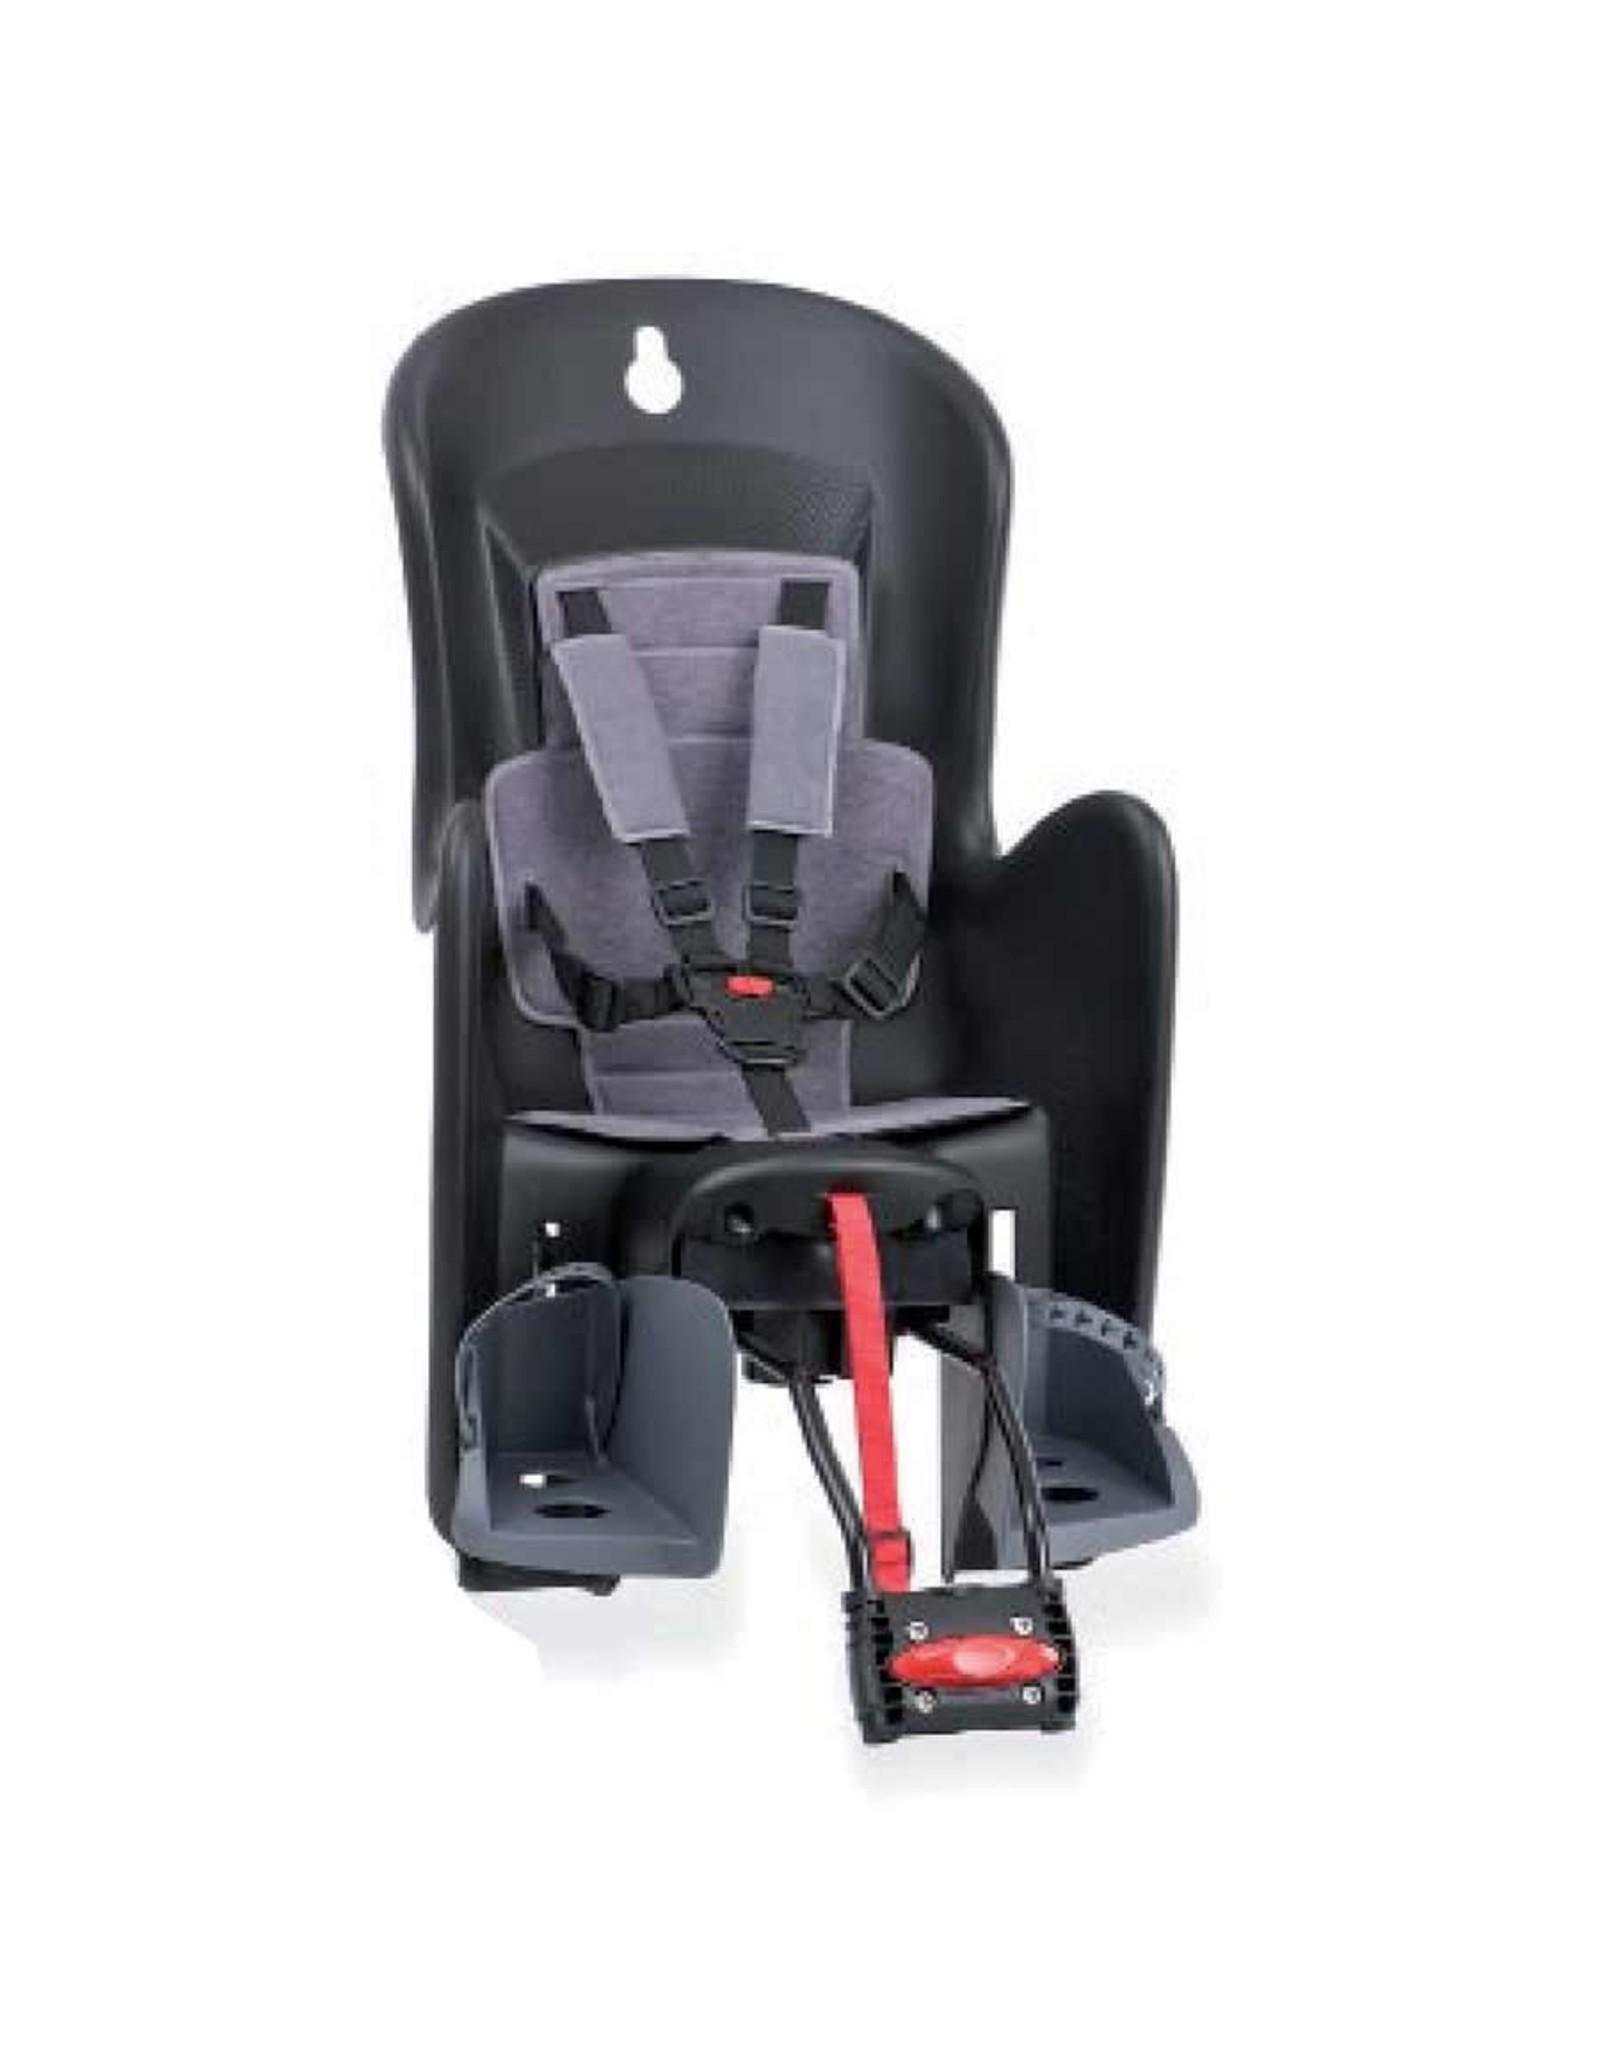 Polisport, Bilby RS, Baby seat, Black/Grey